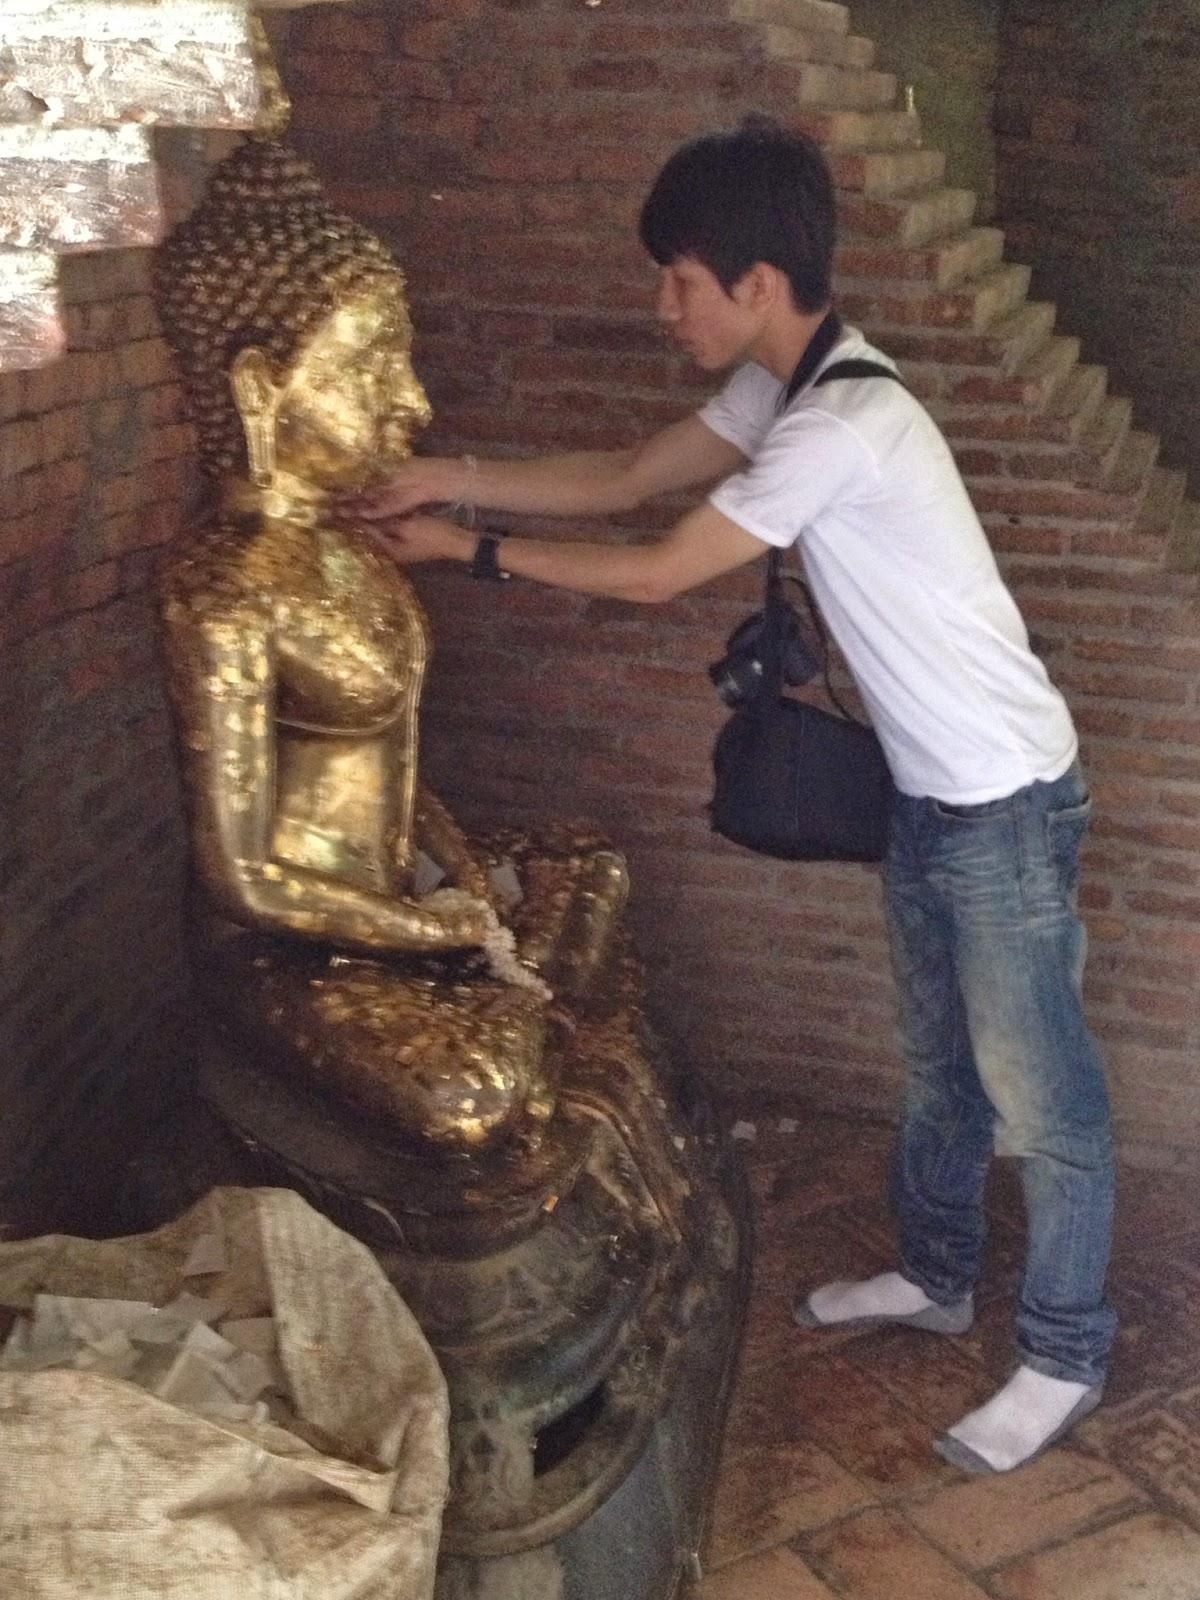 Ayutthaya - Wat Yai Chai Mongkhon - Temple visitors apply small gold leaf squares to Buddha statues